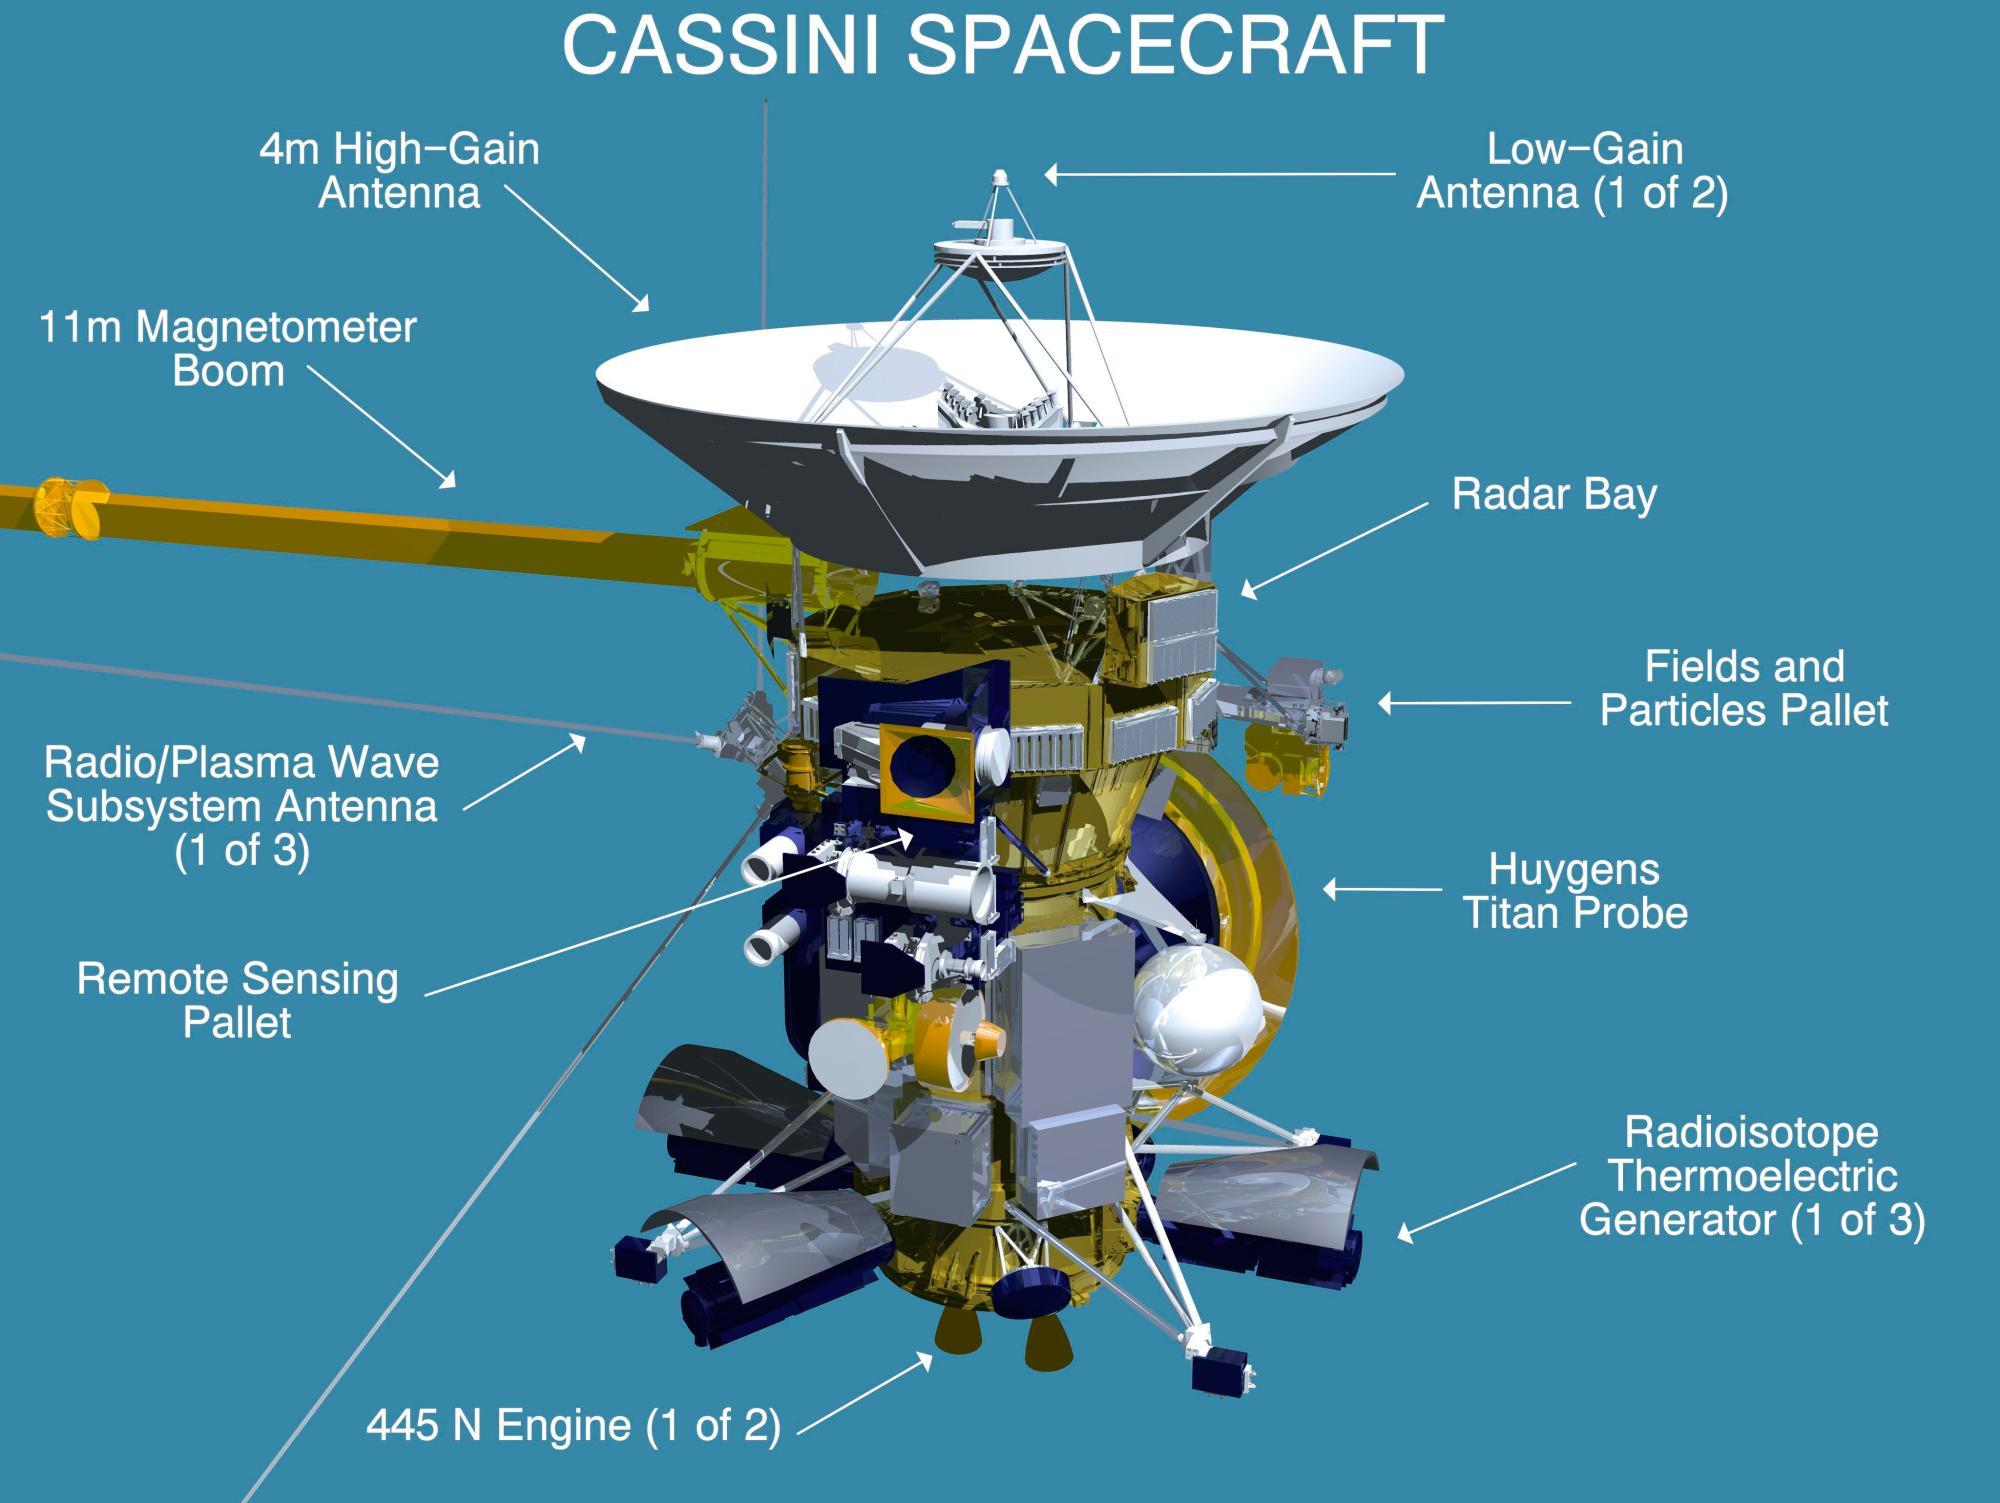 hight resolution of diagram of cassini